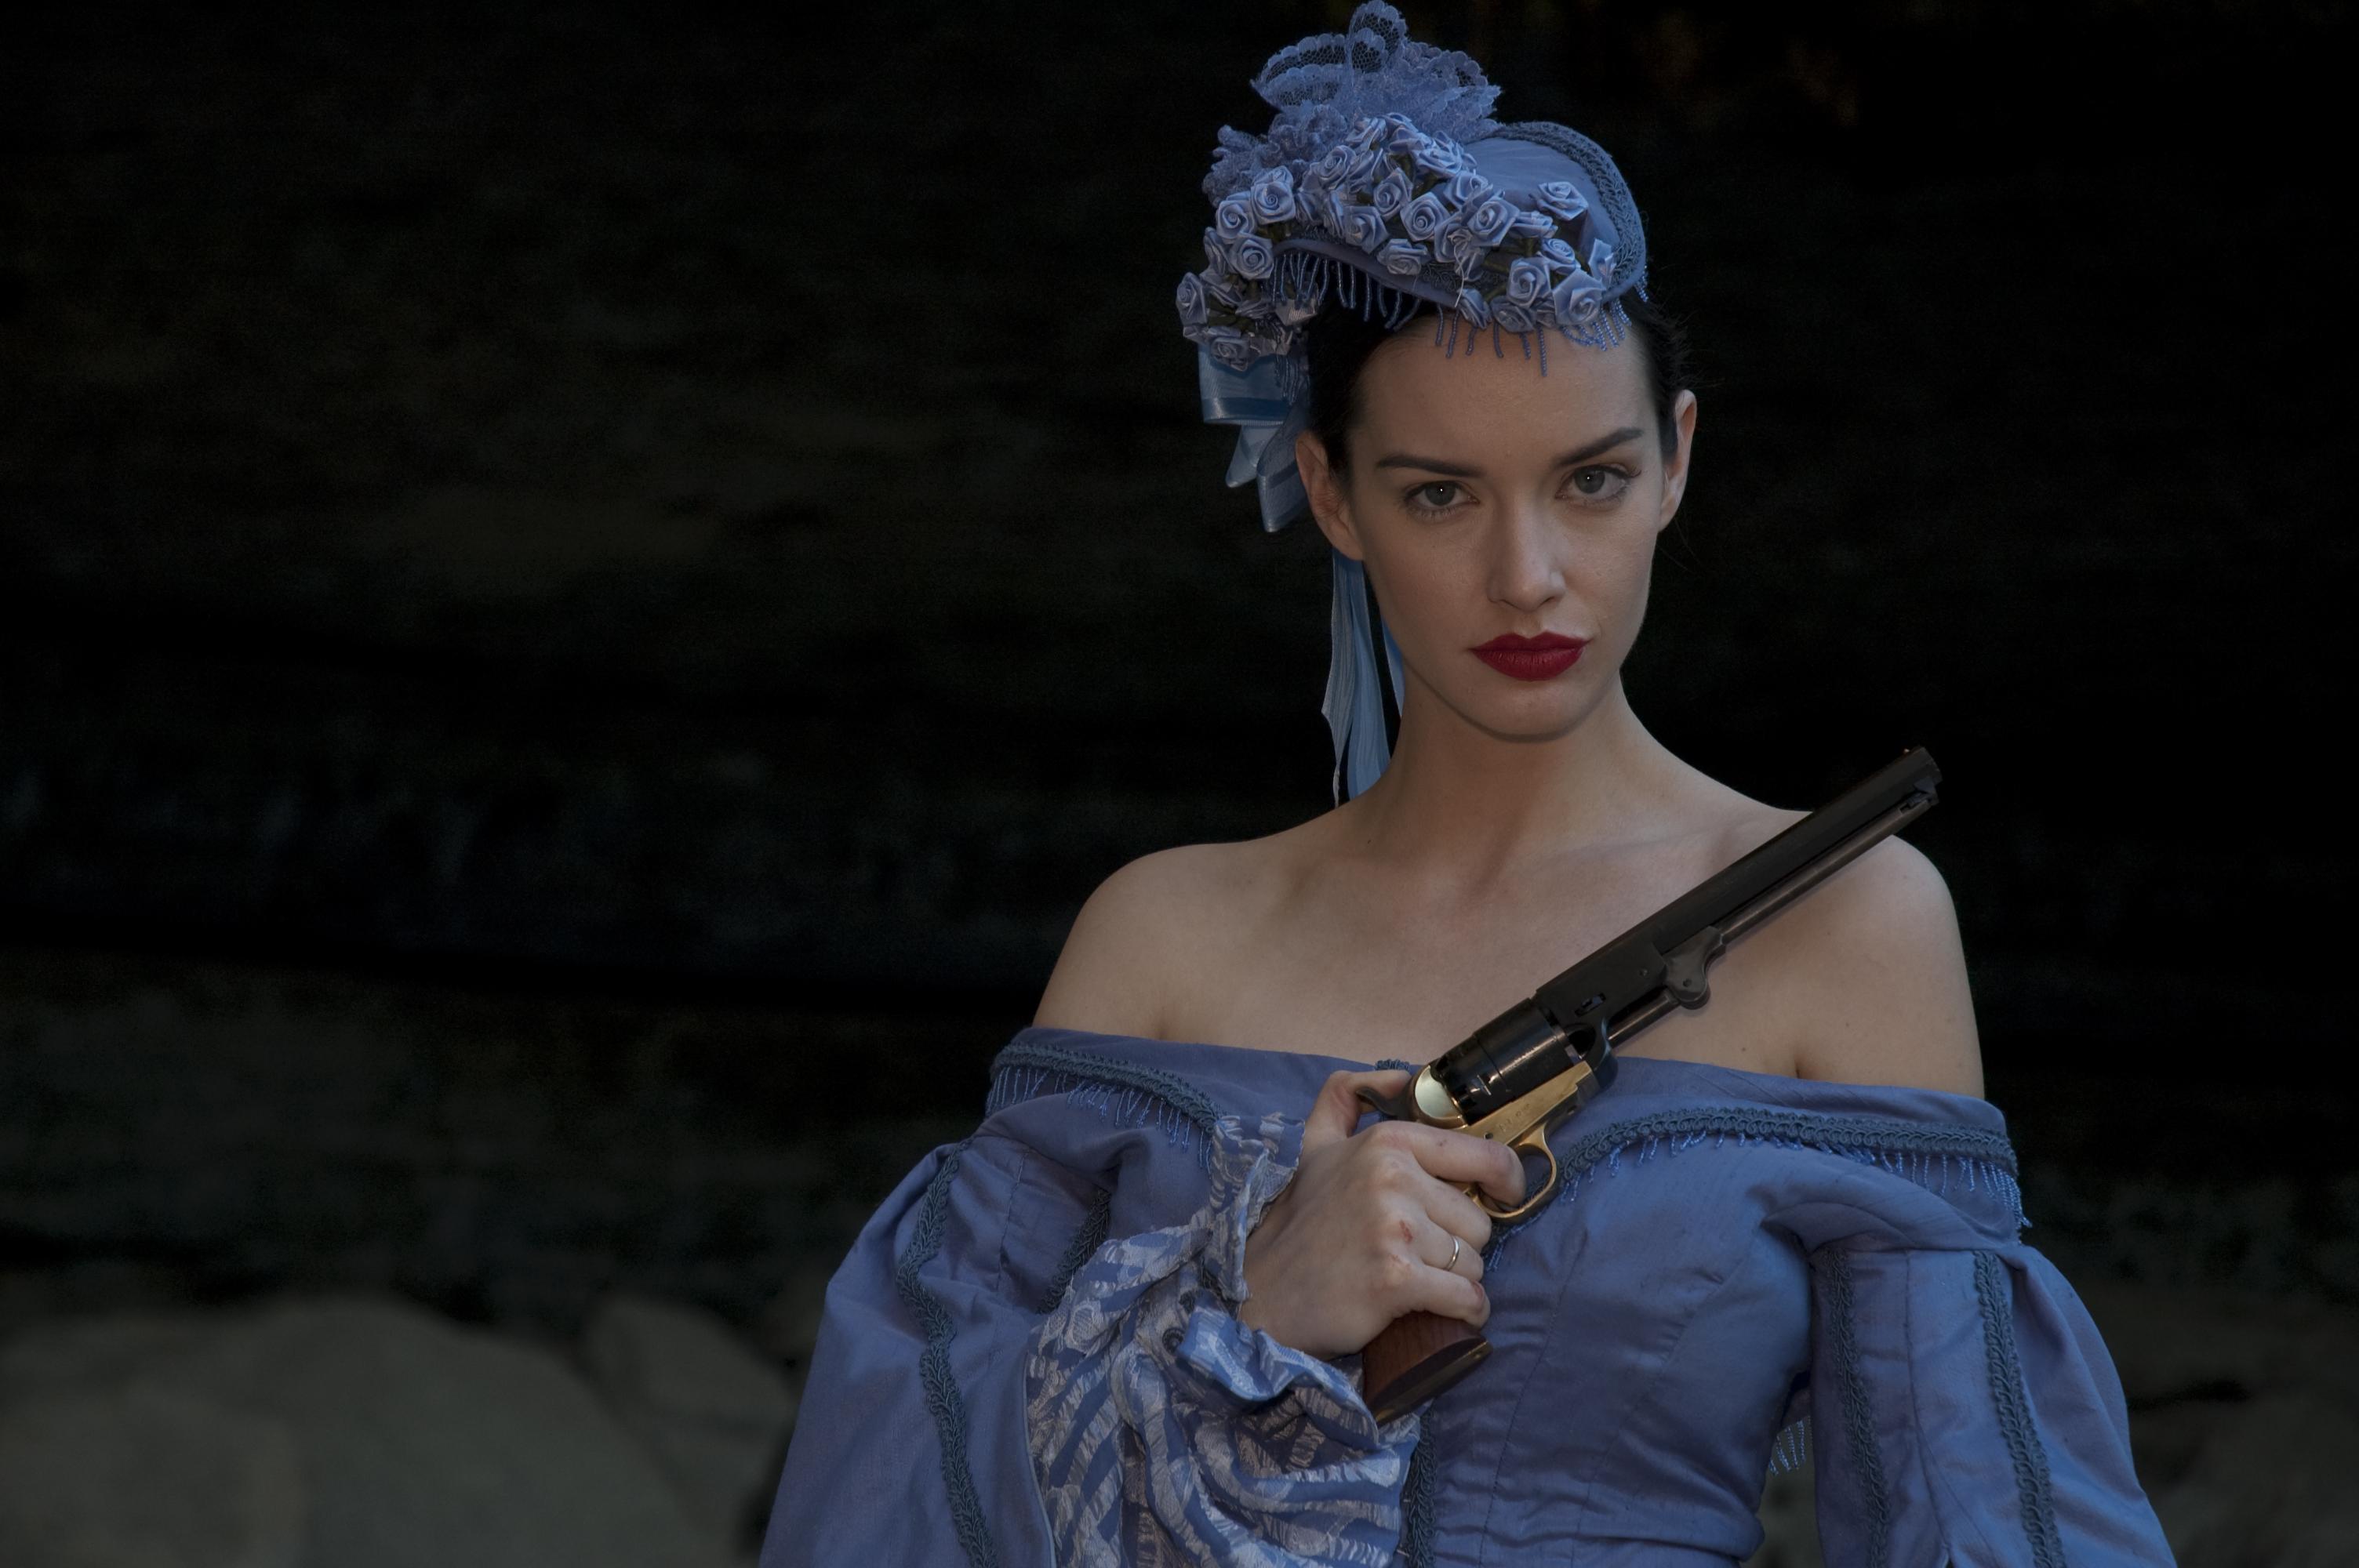 Lady Celestine